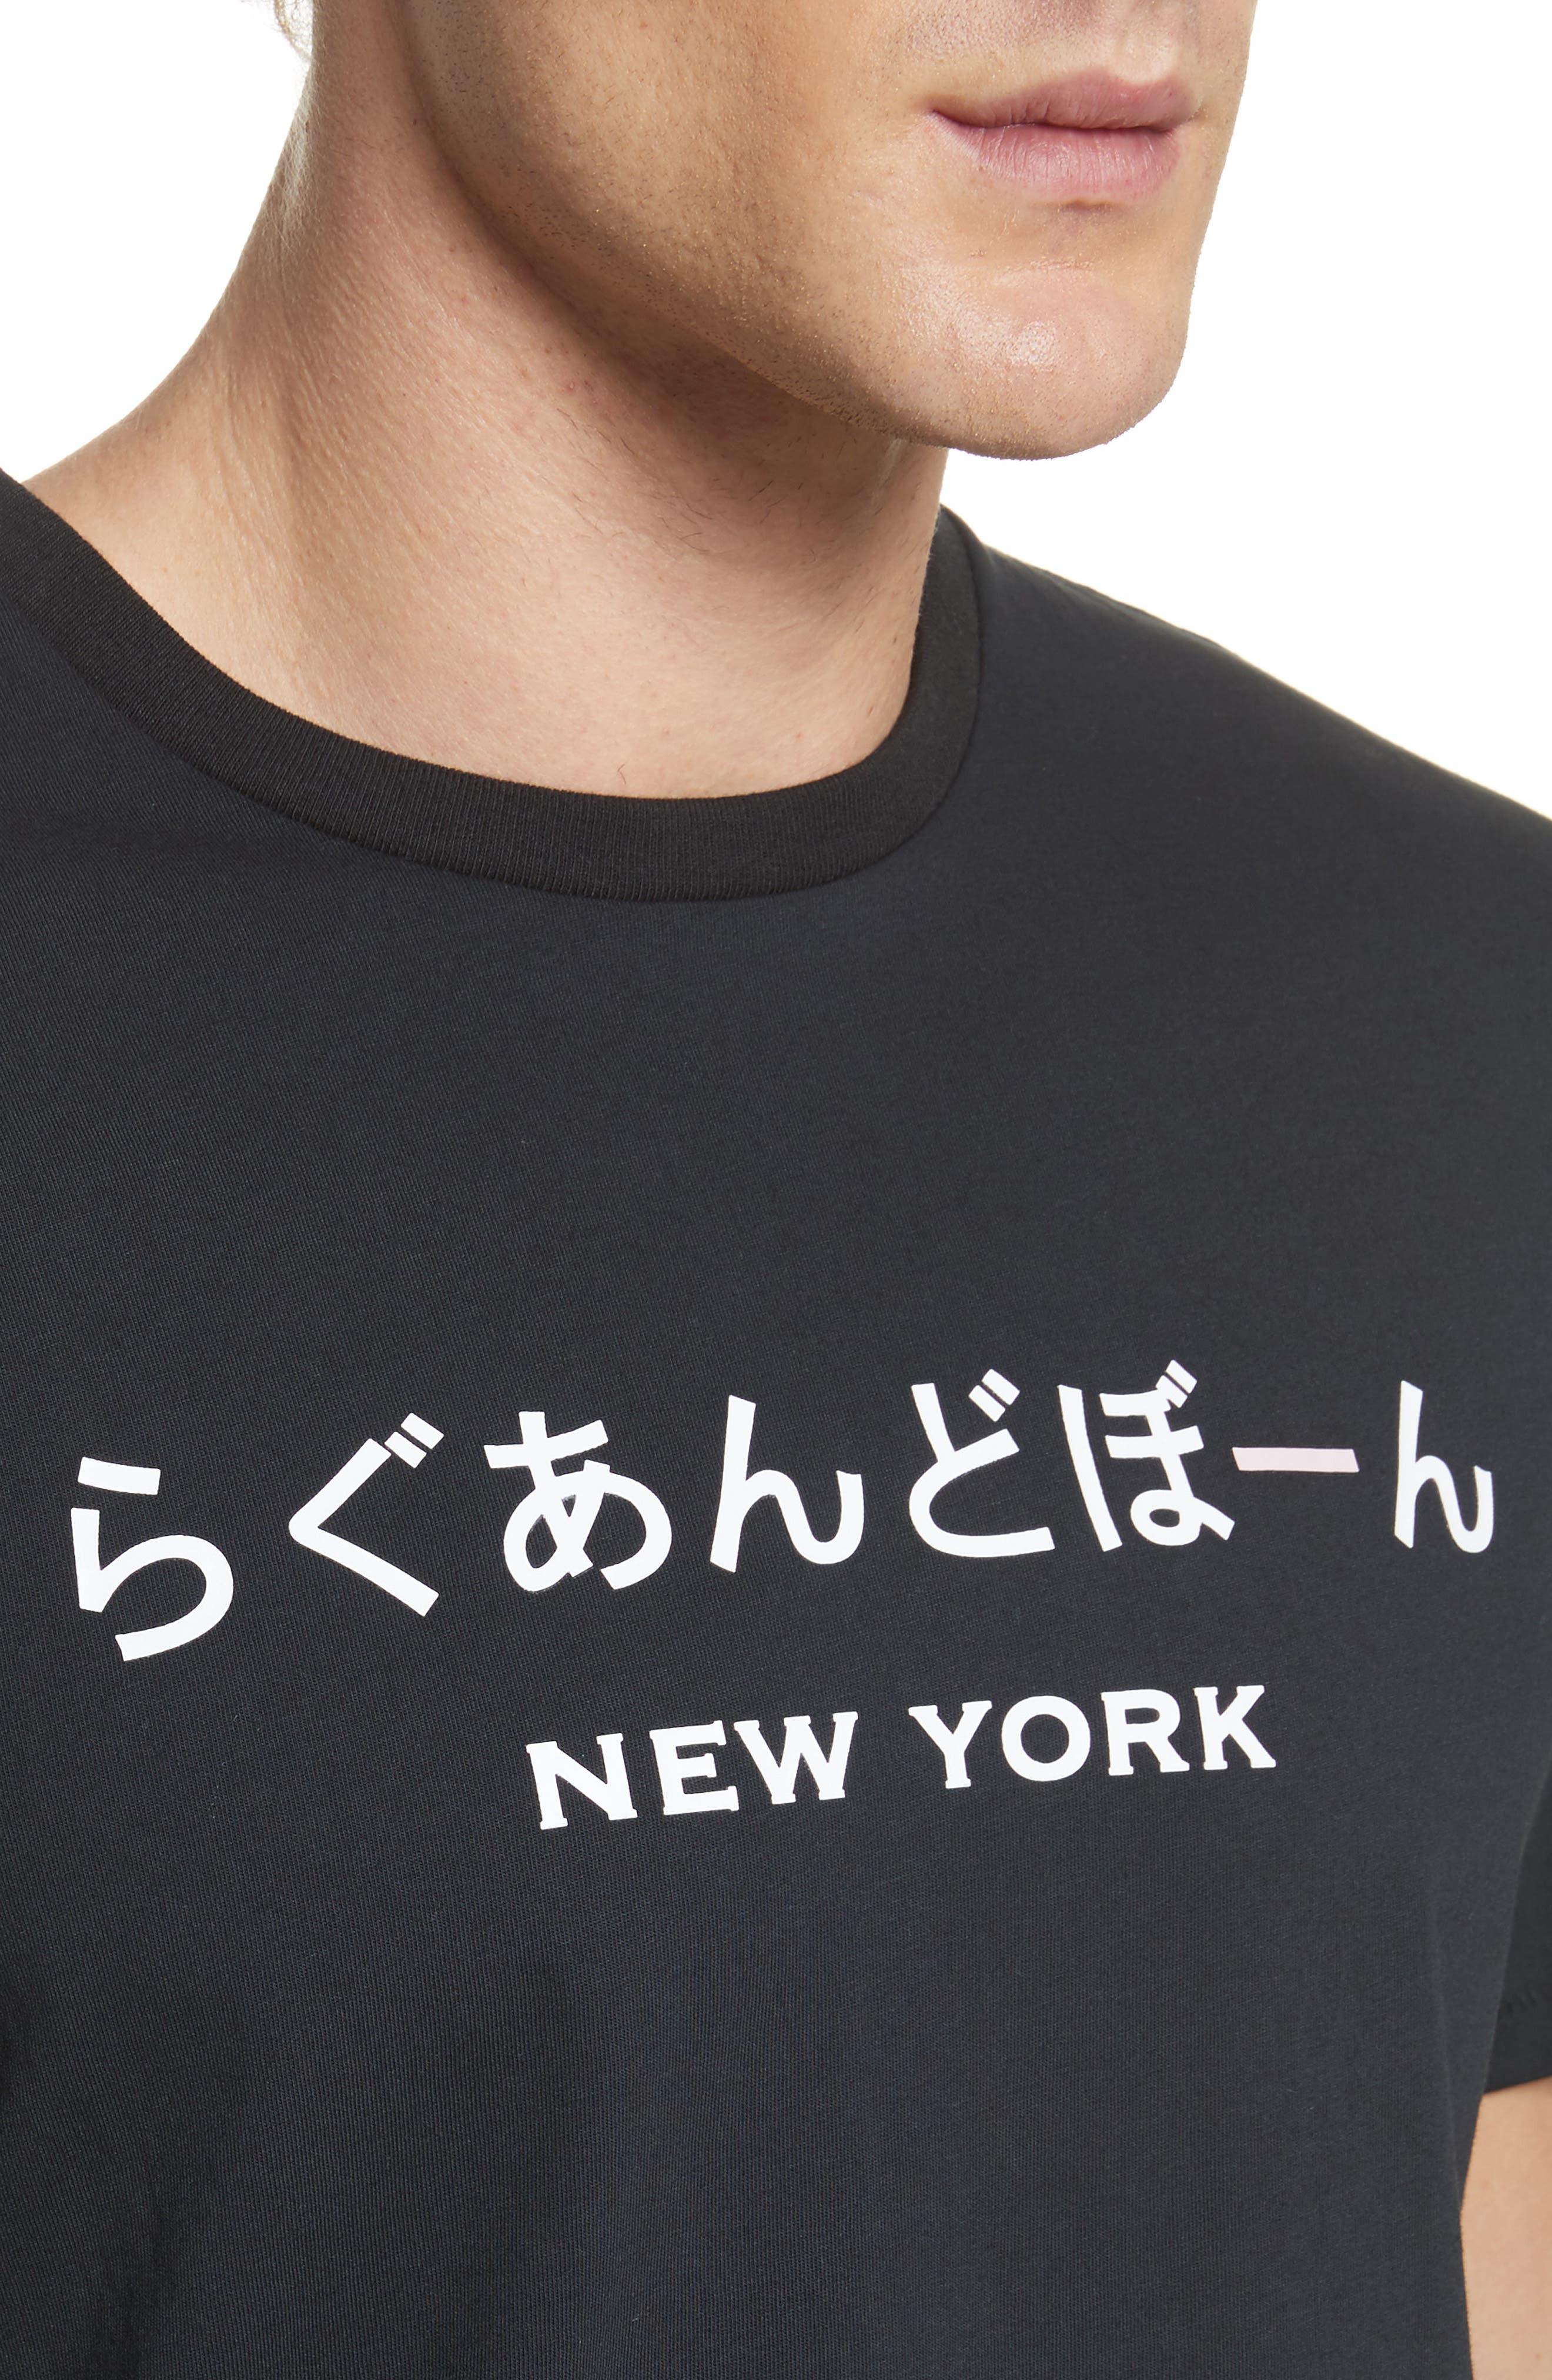 Japan Graphic T-Shirt,                             Alternate thumbnail 4, color,                             001